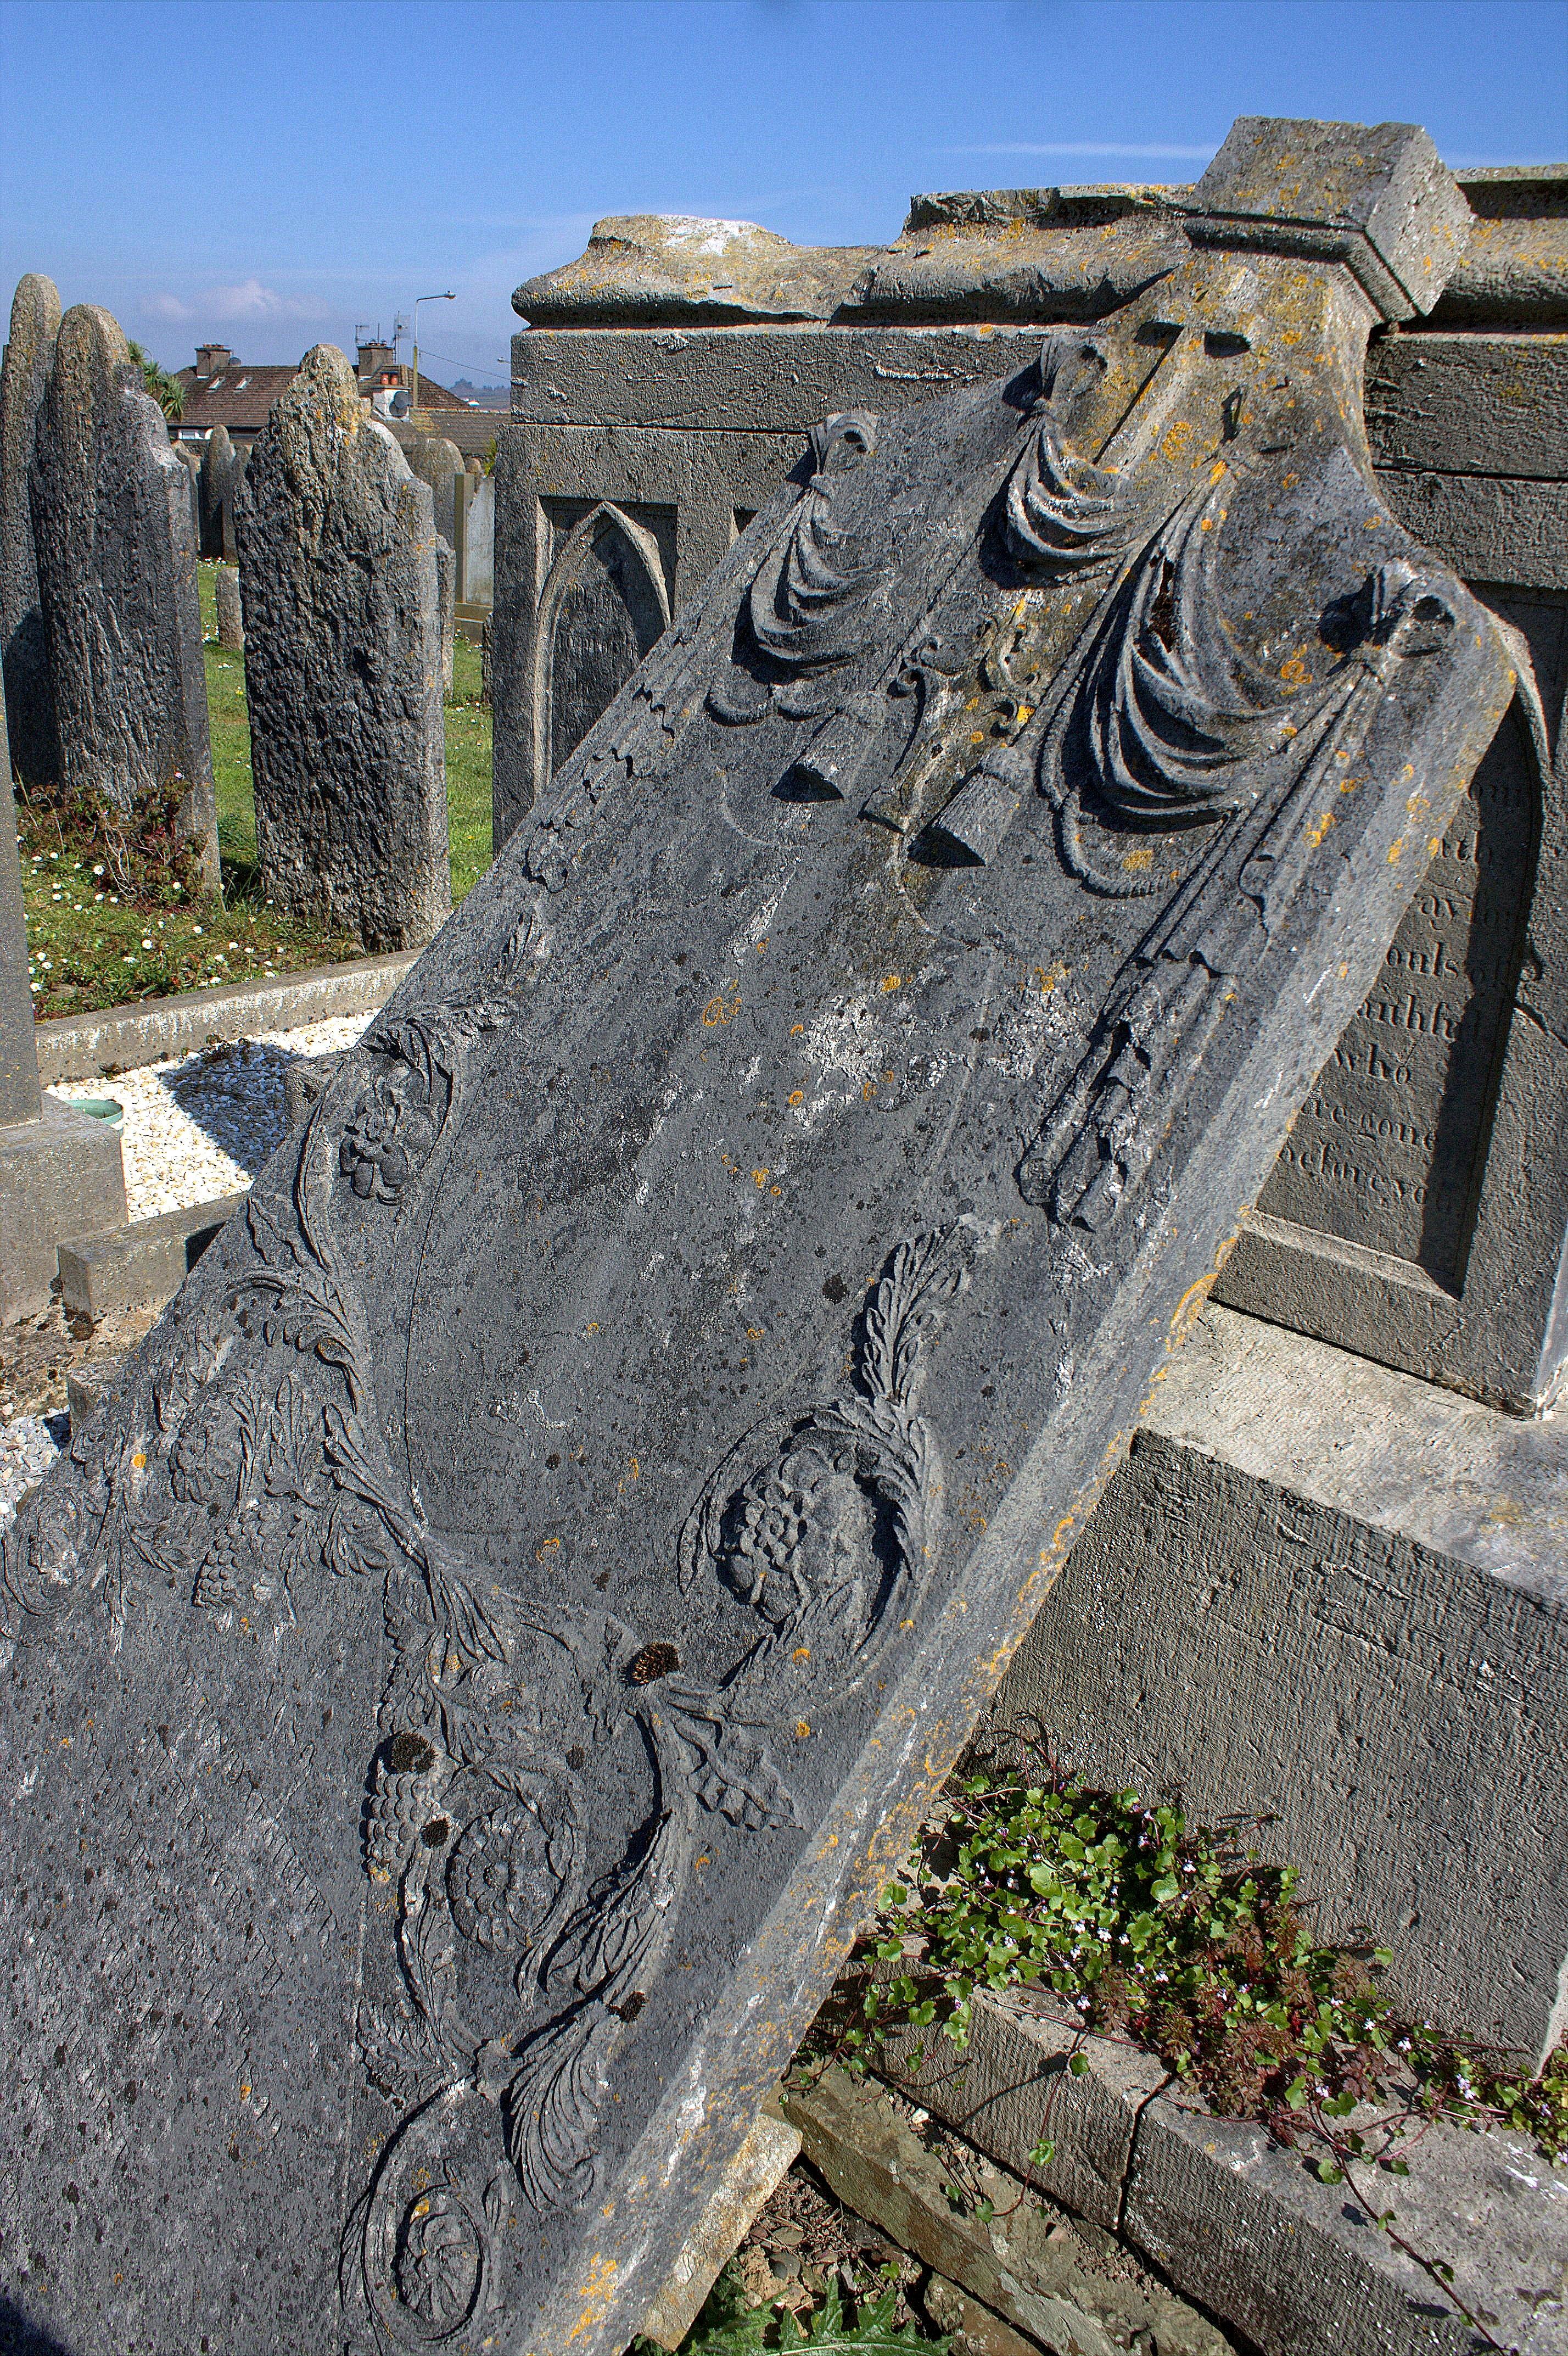 05. North Abbey Youghal, Cork, Ireland